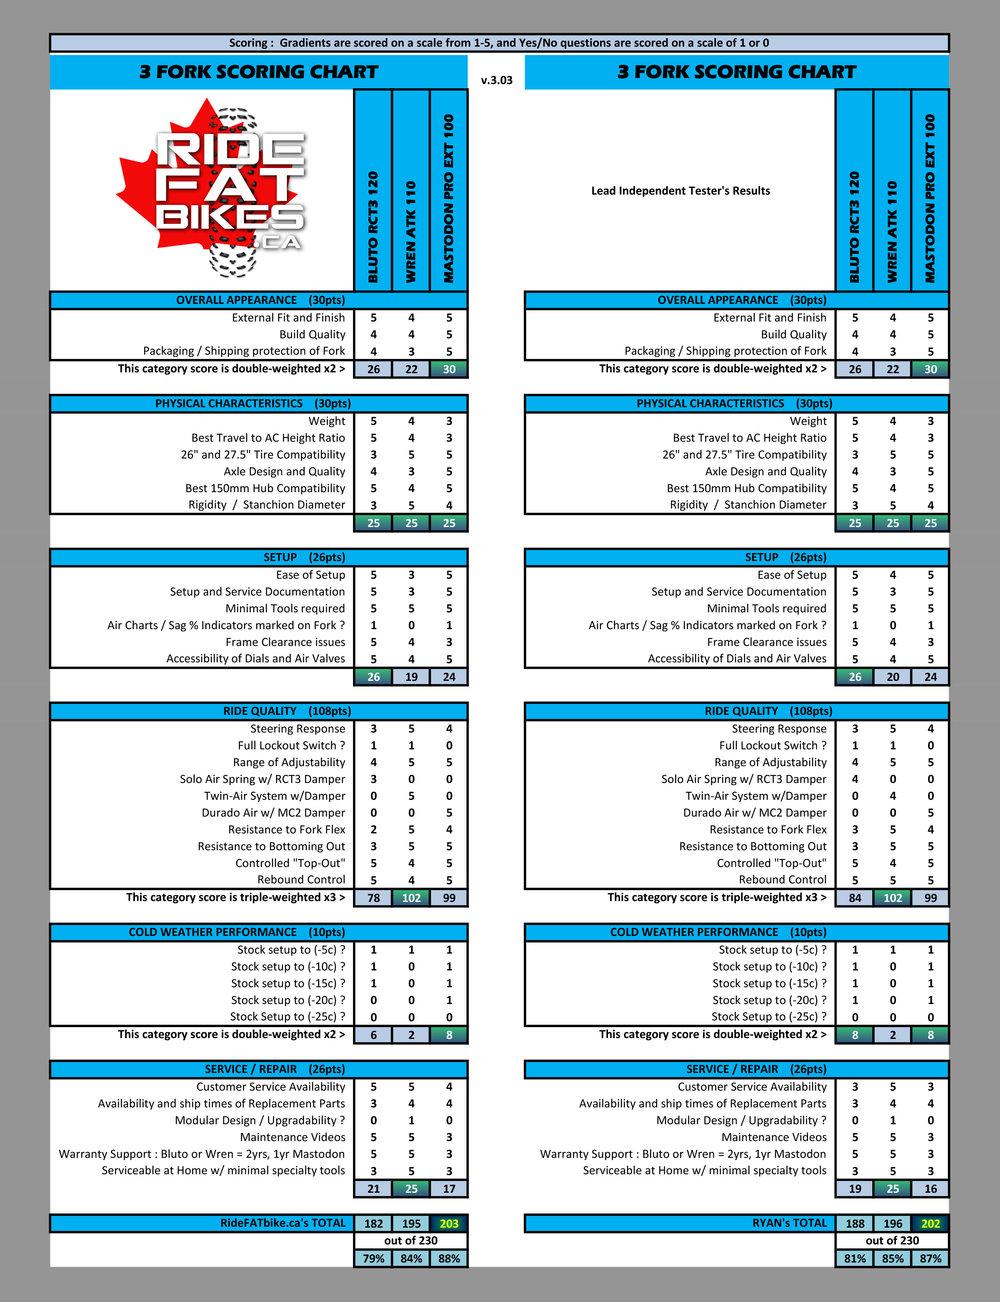 3 FORK SCORING CHART - BLUTO RCT3 - WREN ATK - MASTODON PRO - RIDEFATBIKES.ca